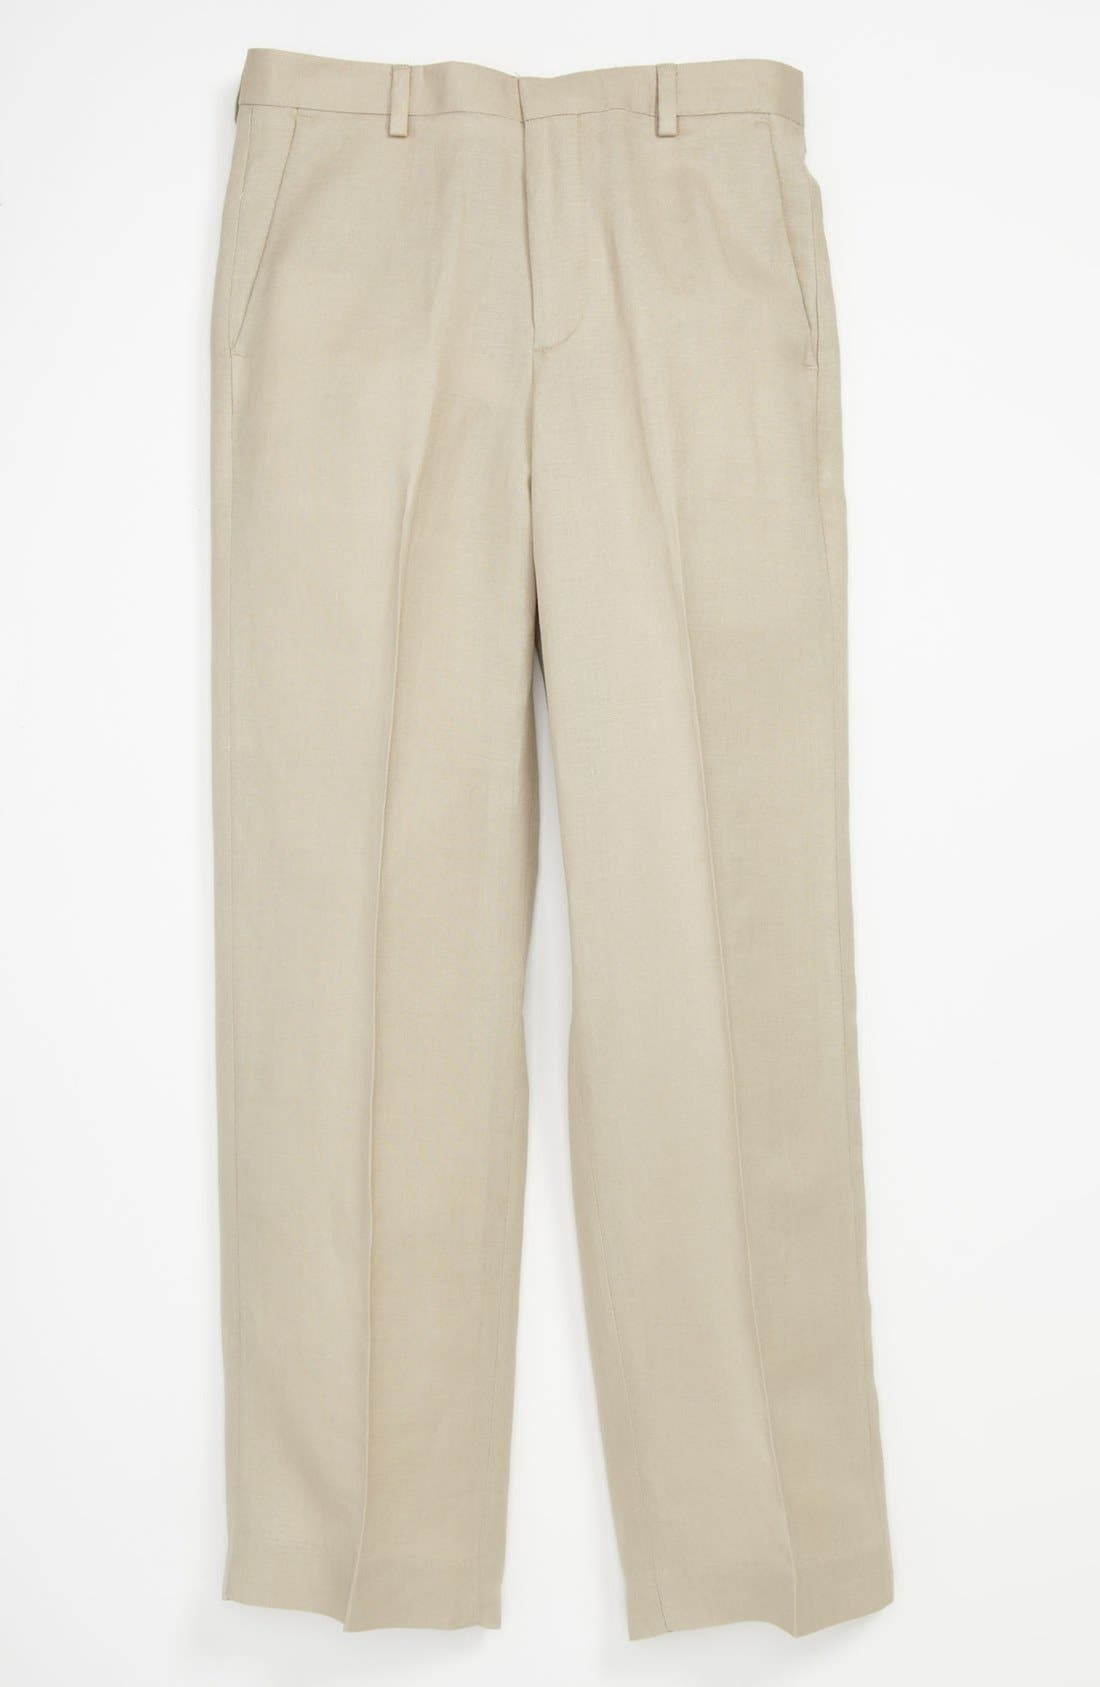 Main Image - Nordstrom 'Phillip' Linen Blend Trousers (Little Boys & Big Boys)